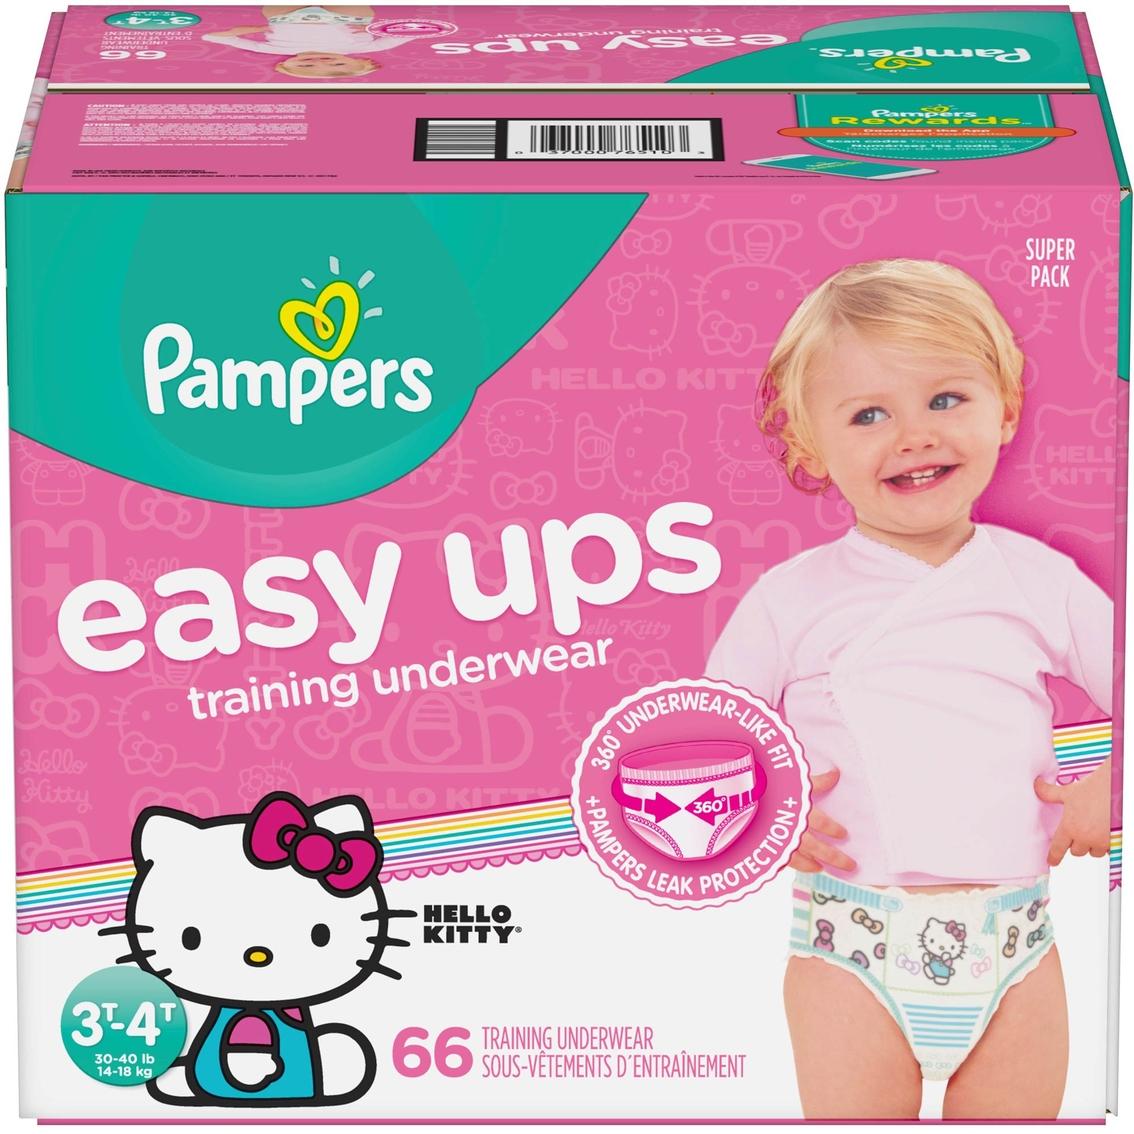 78ae9ec7ffc Pampers Girls Easy Ups Training Underwear Size 3t-4t (30-10 Lb.) 66 ...